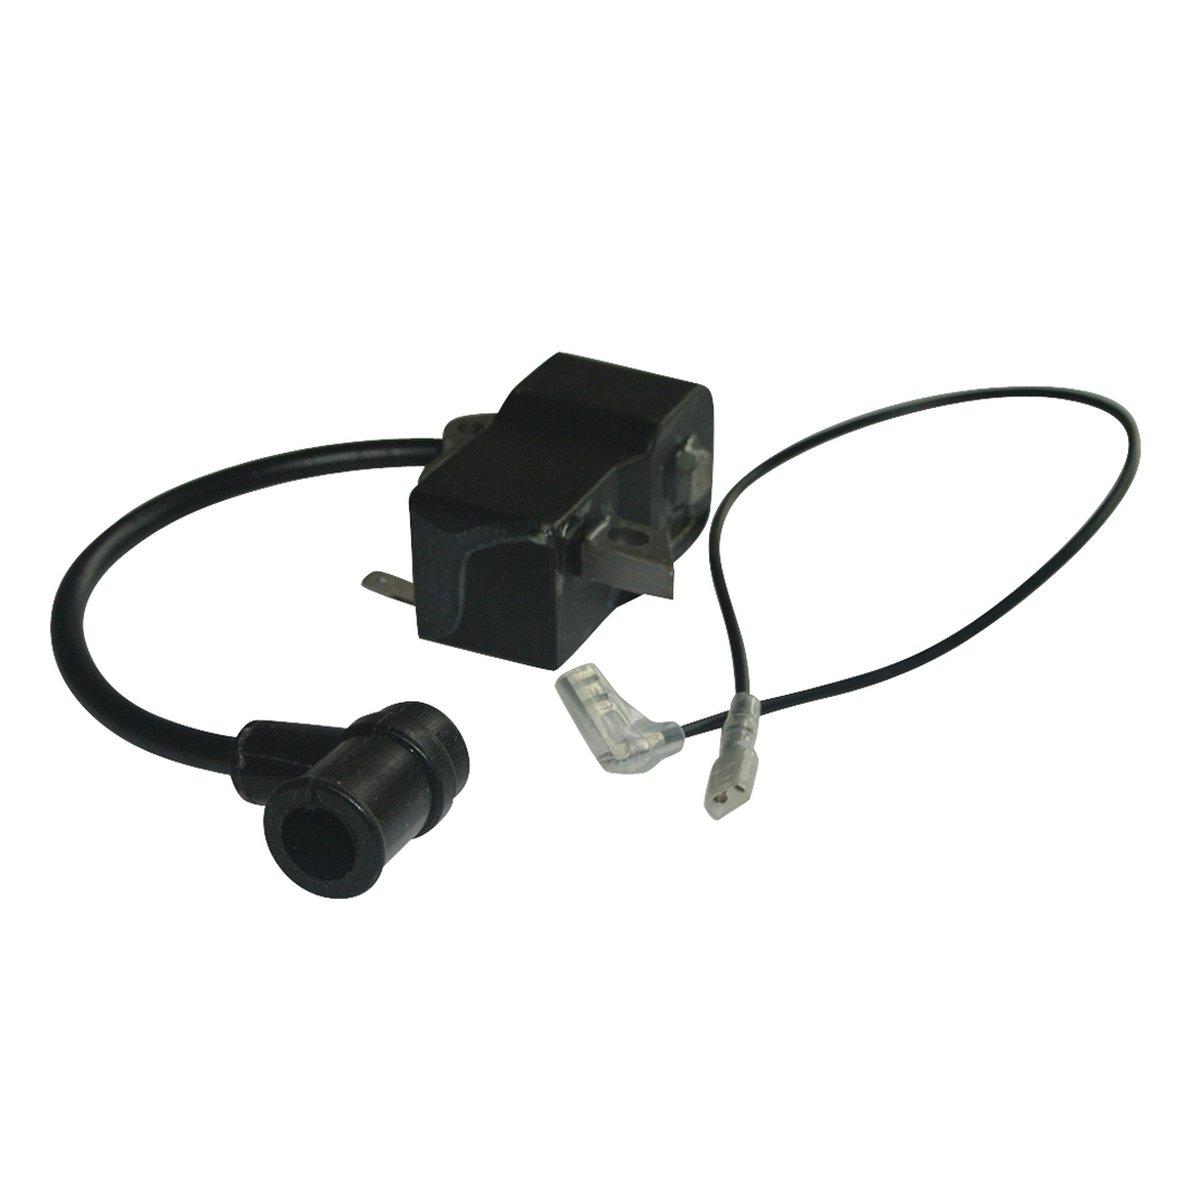 New Ignition Coil Fit For STIHL FS75 FS80 FS80R FS85 FS85R Grass Trimmer Lawnmower